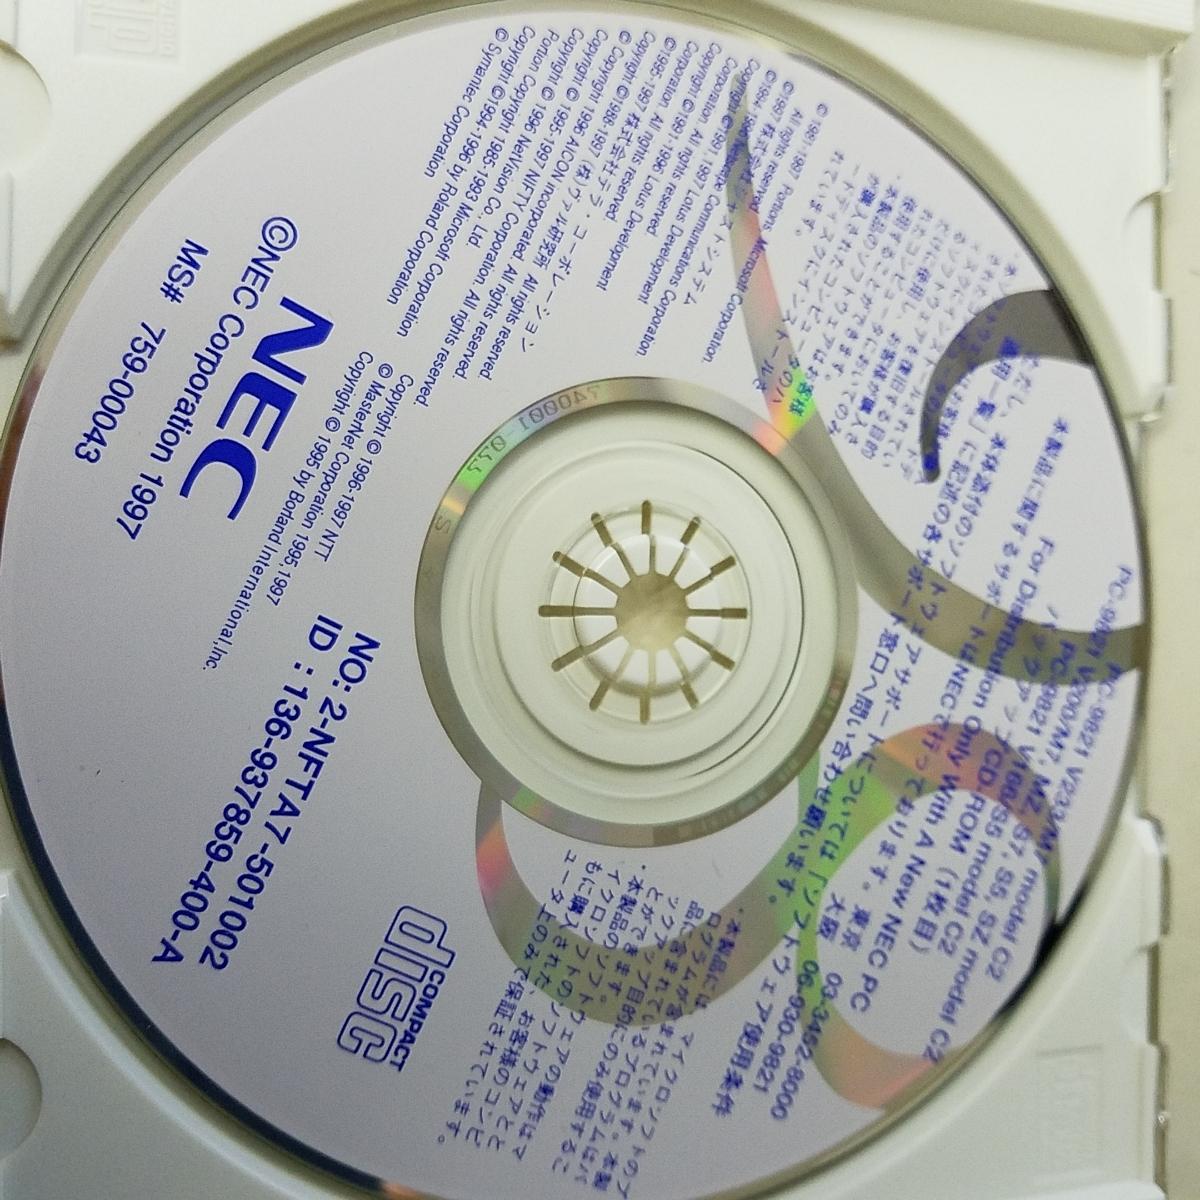 PC-9821V233/M7modelC2バックアップCD-ROM2枚